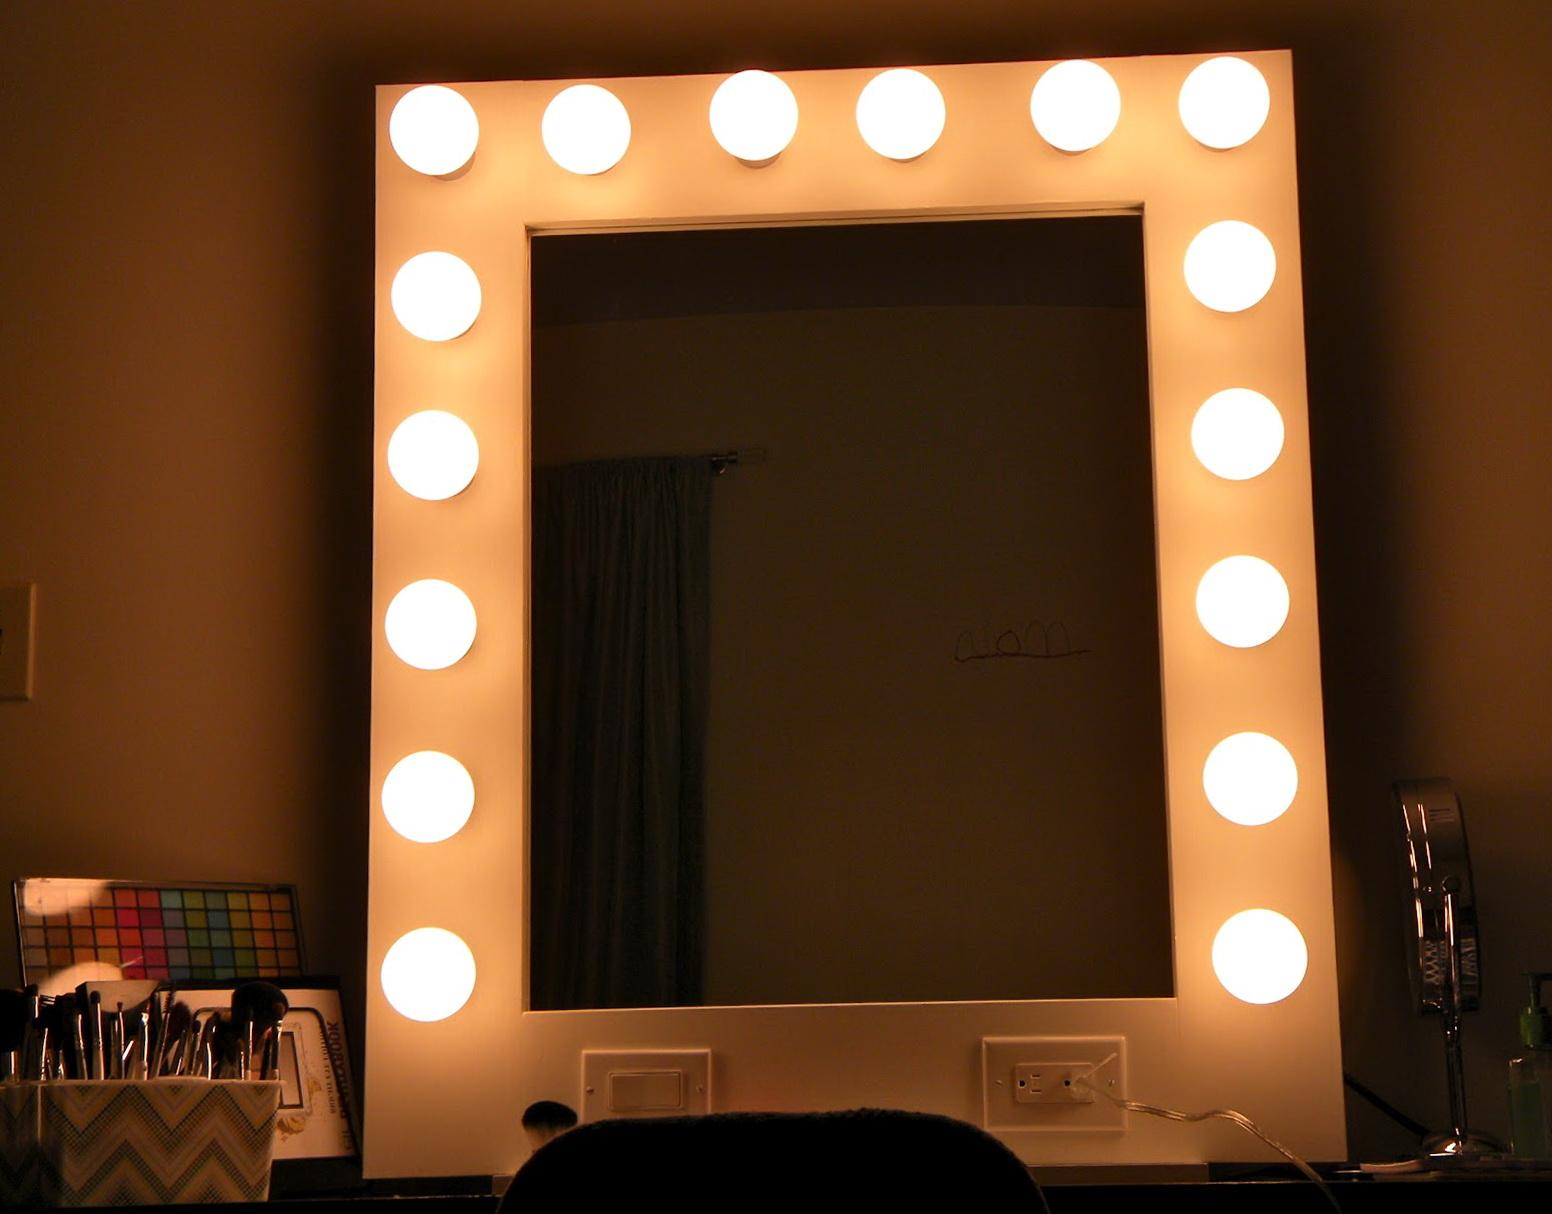 Light Up Vanity Mirror Amazon